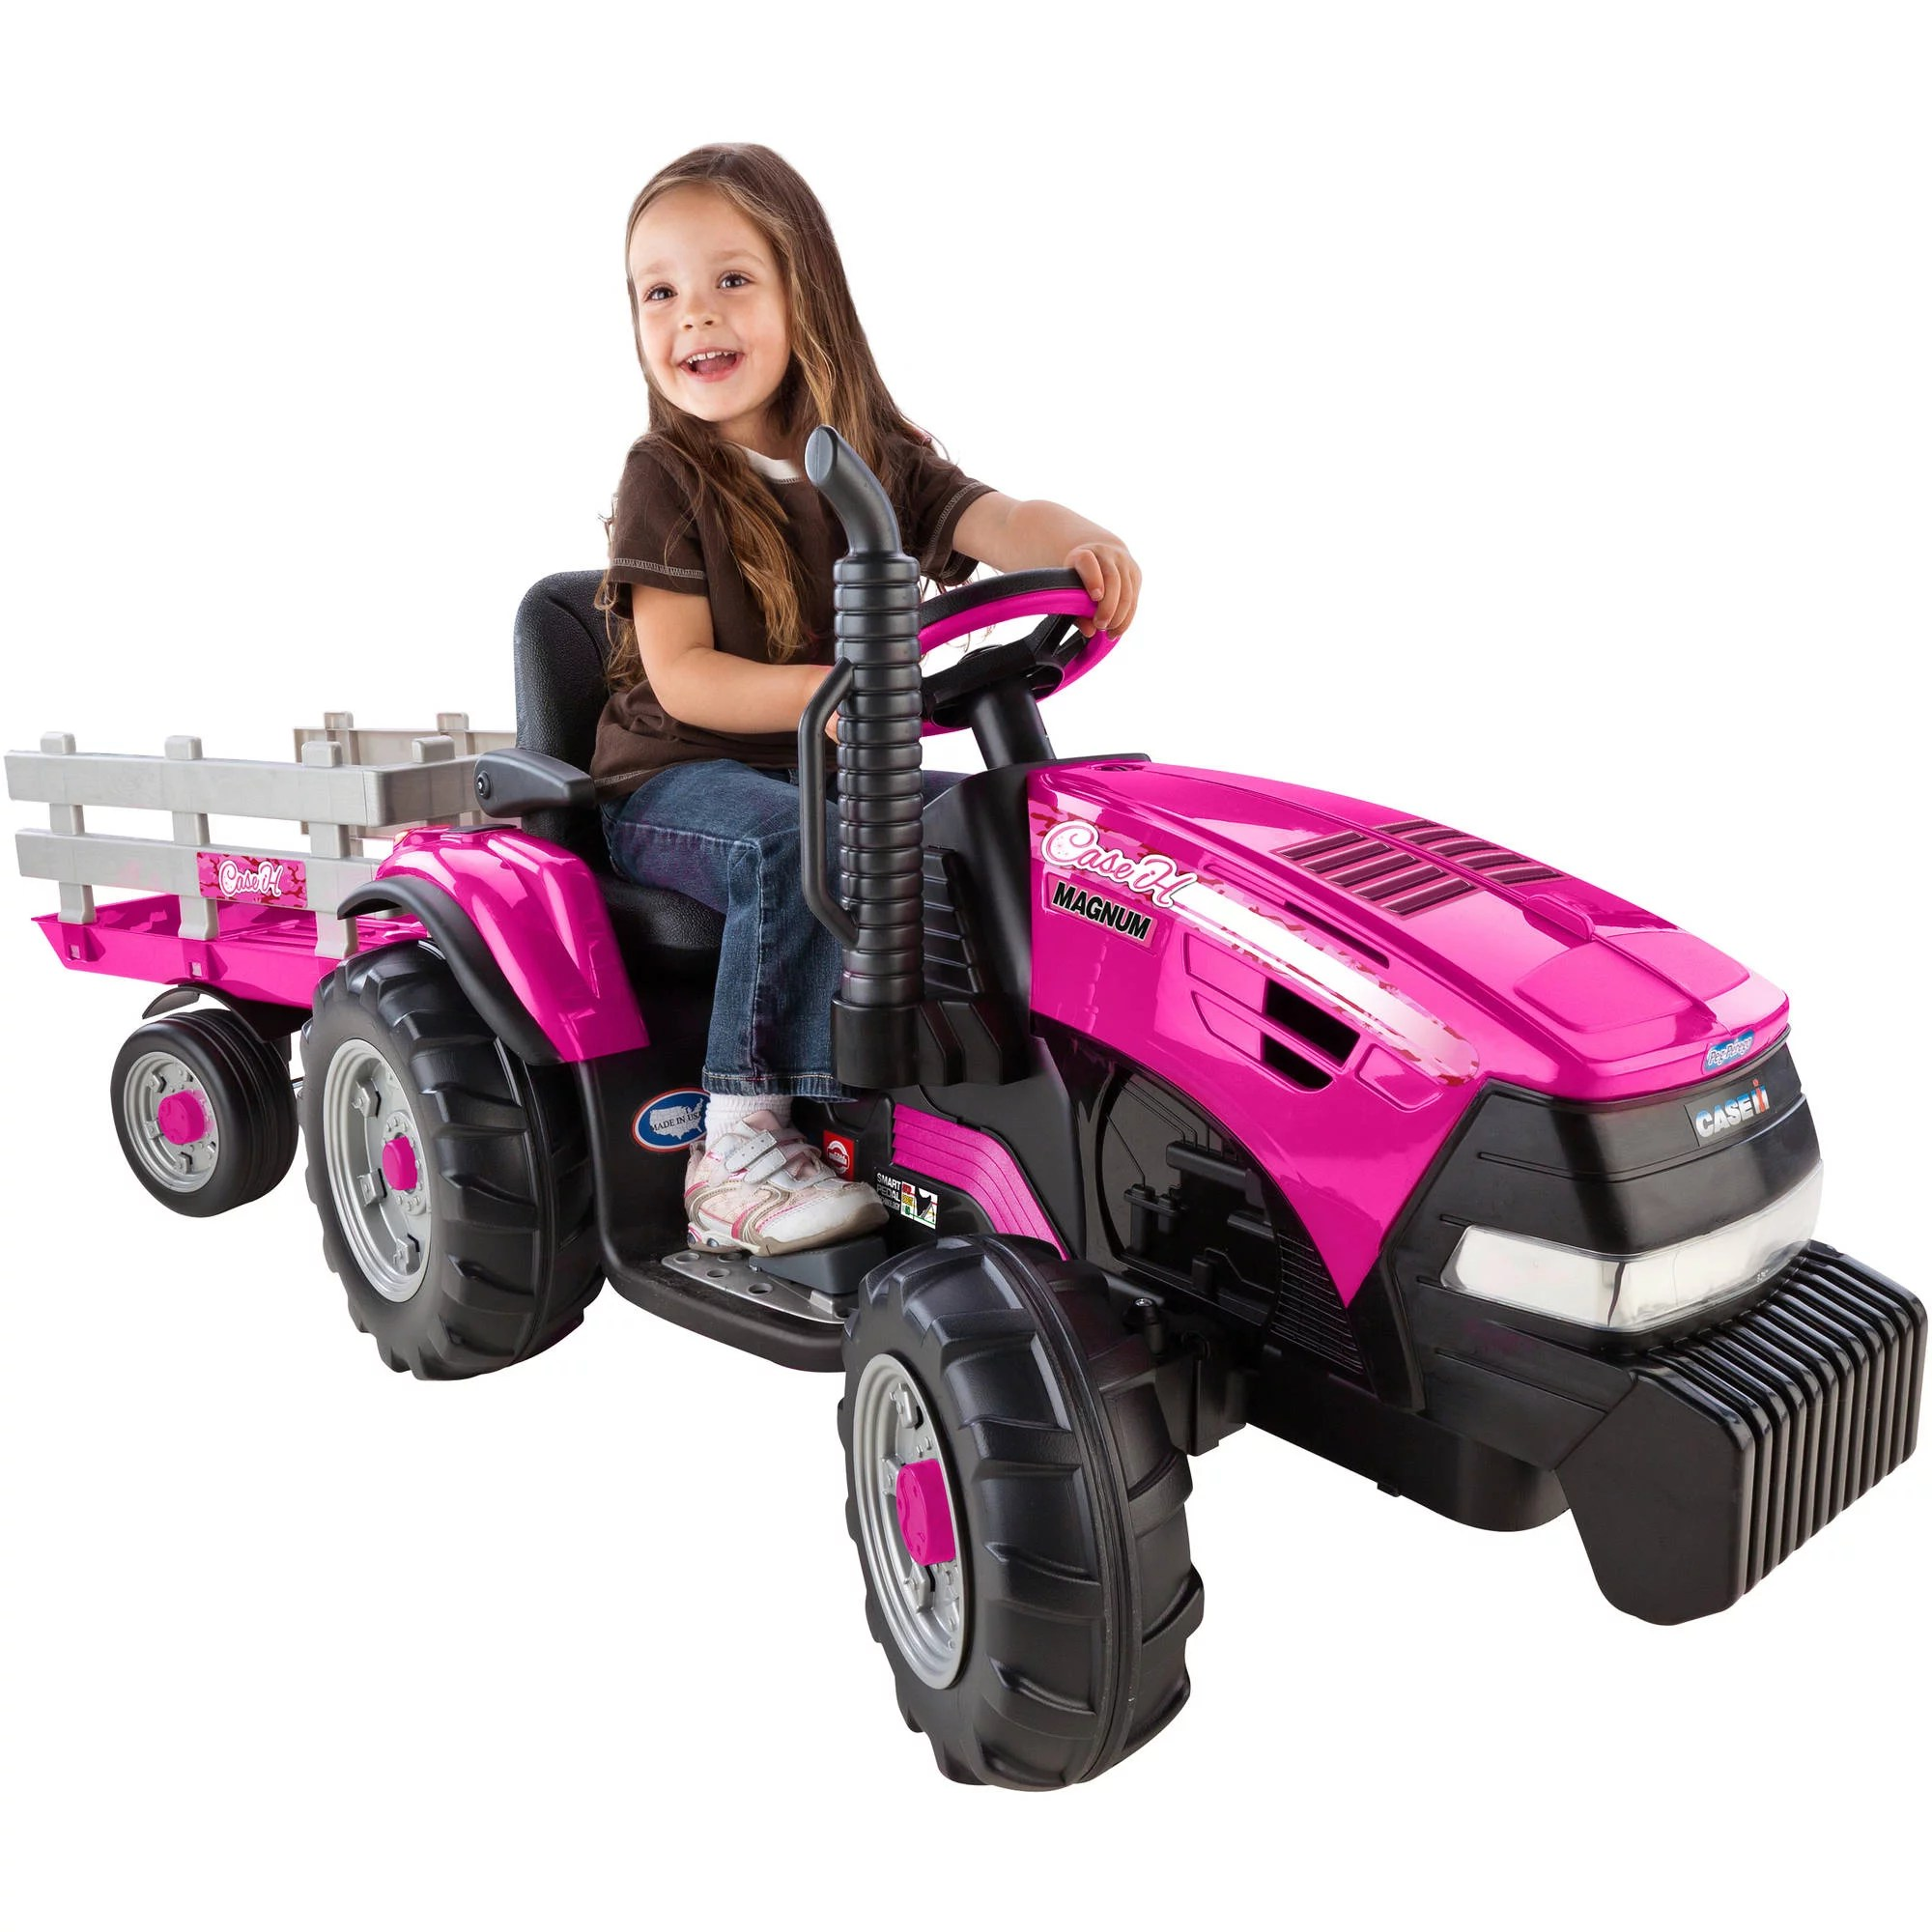 Case Ih Magnum Tractor And Trailer Girls 12 Volt Battery